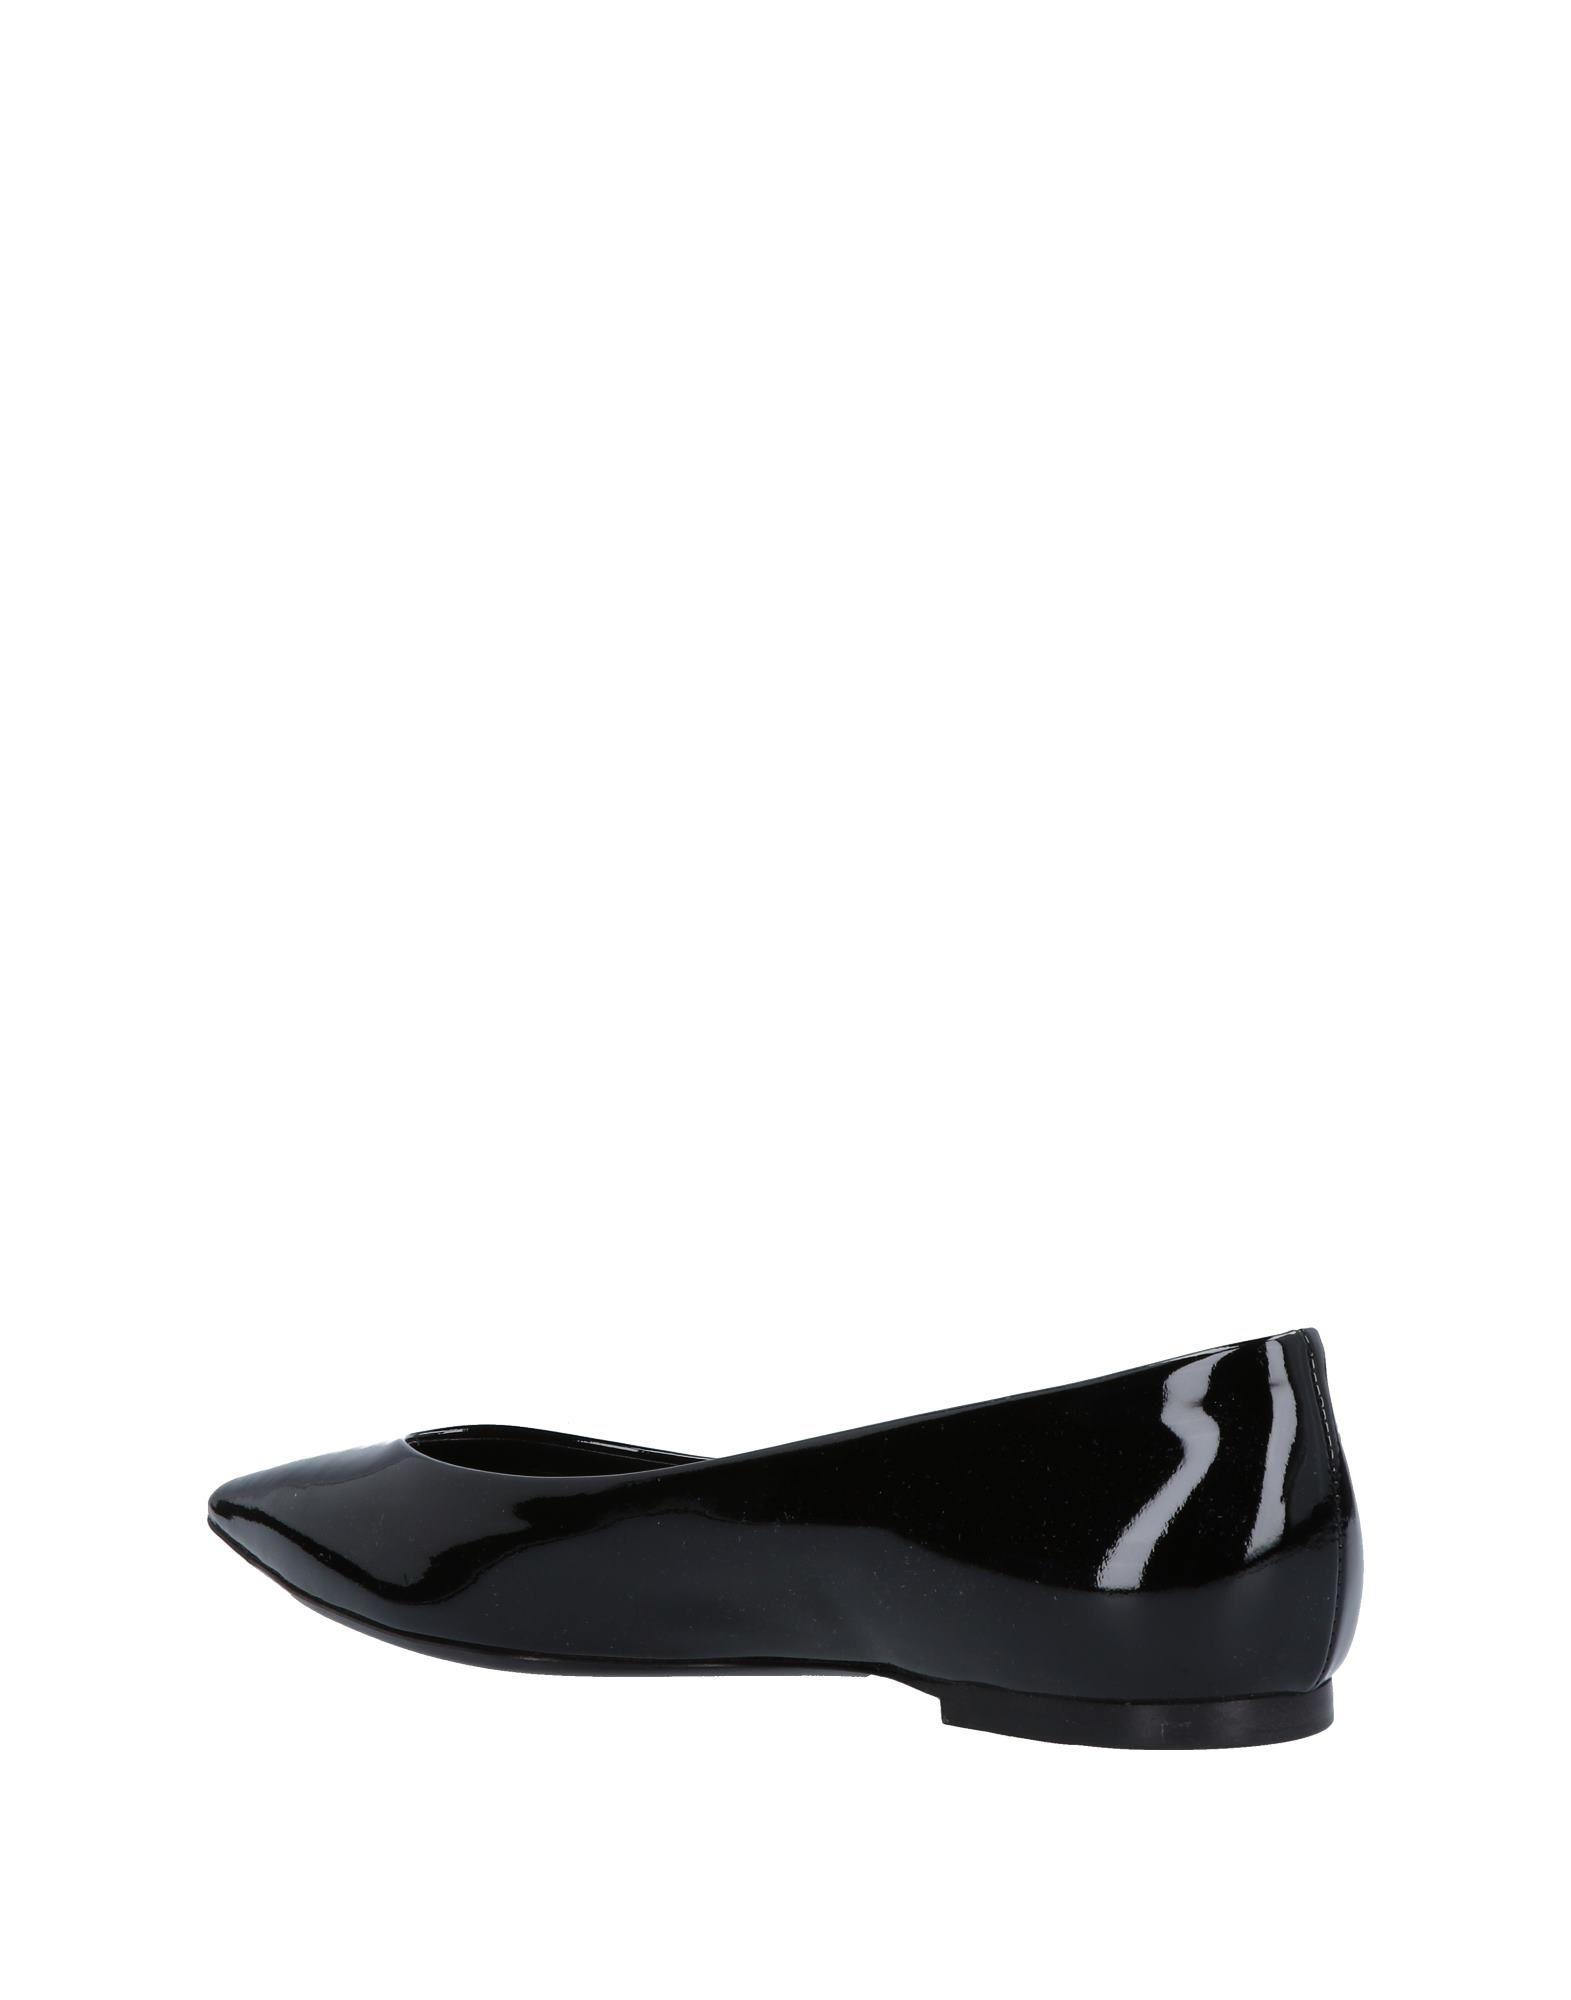 Rabatt  Schuhe Balenciaga Ballerinas Damen  Rabatt 11489968LT c8ac1c